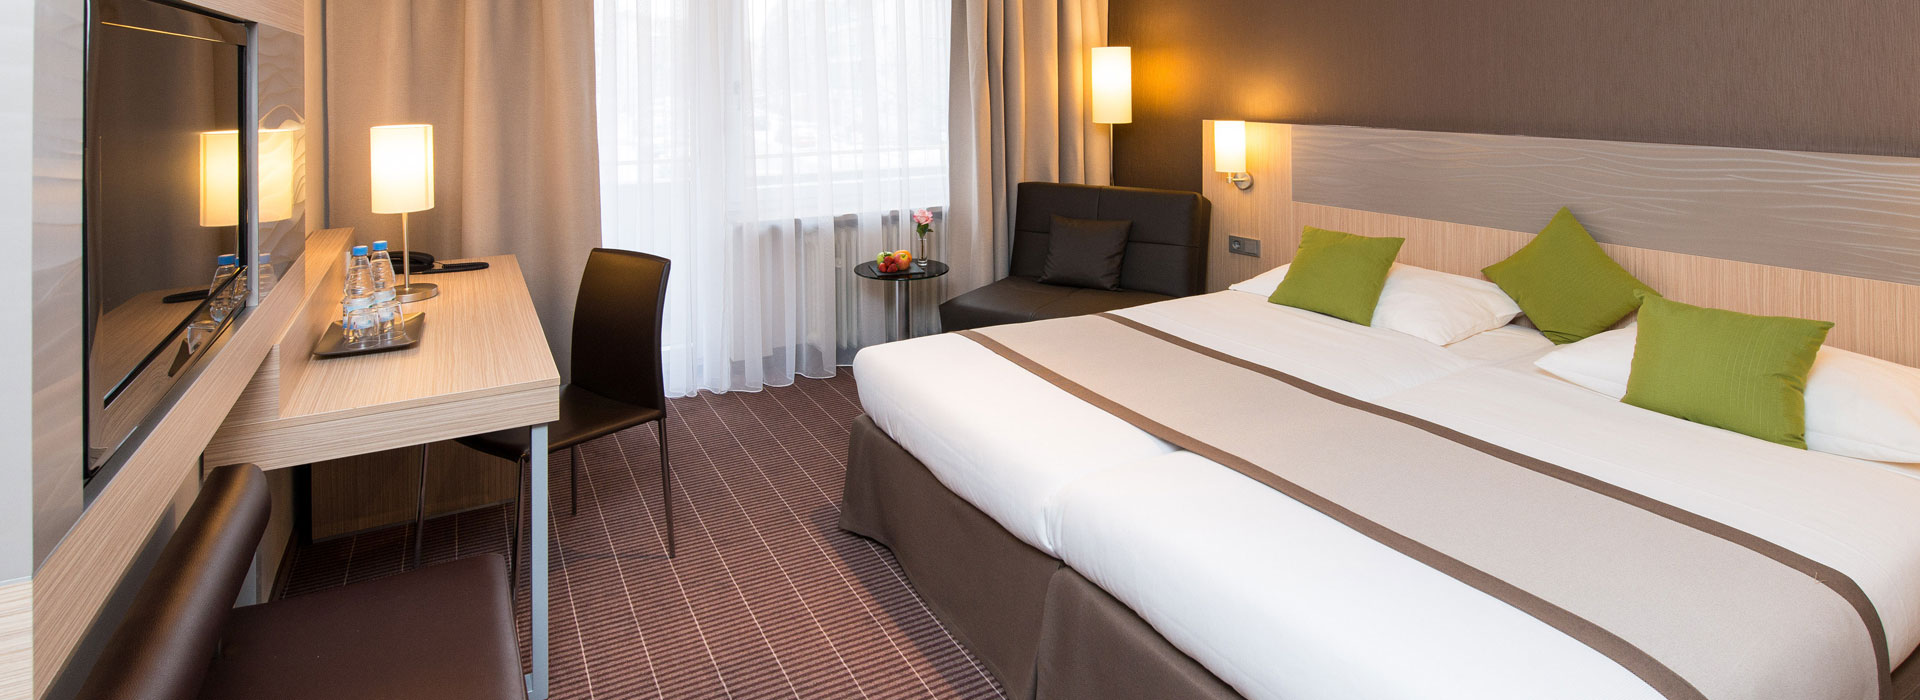 hotel in münchen nähe hauptbahnhof